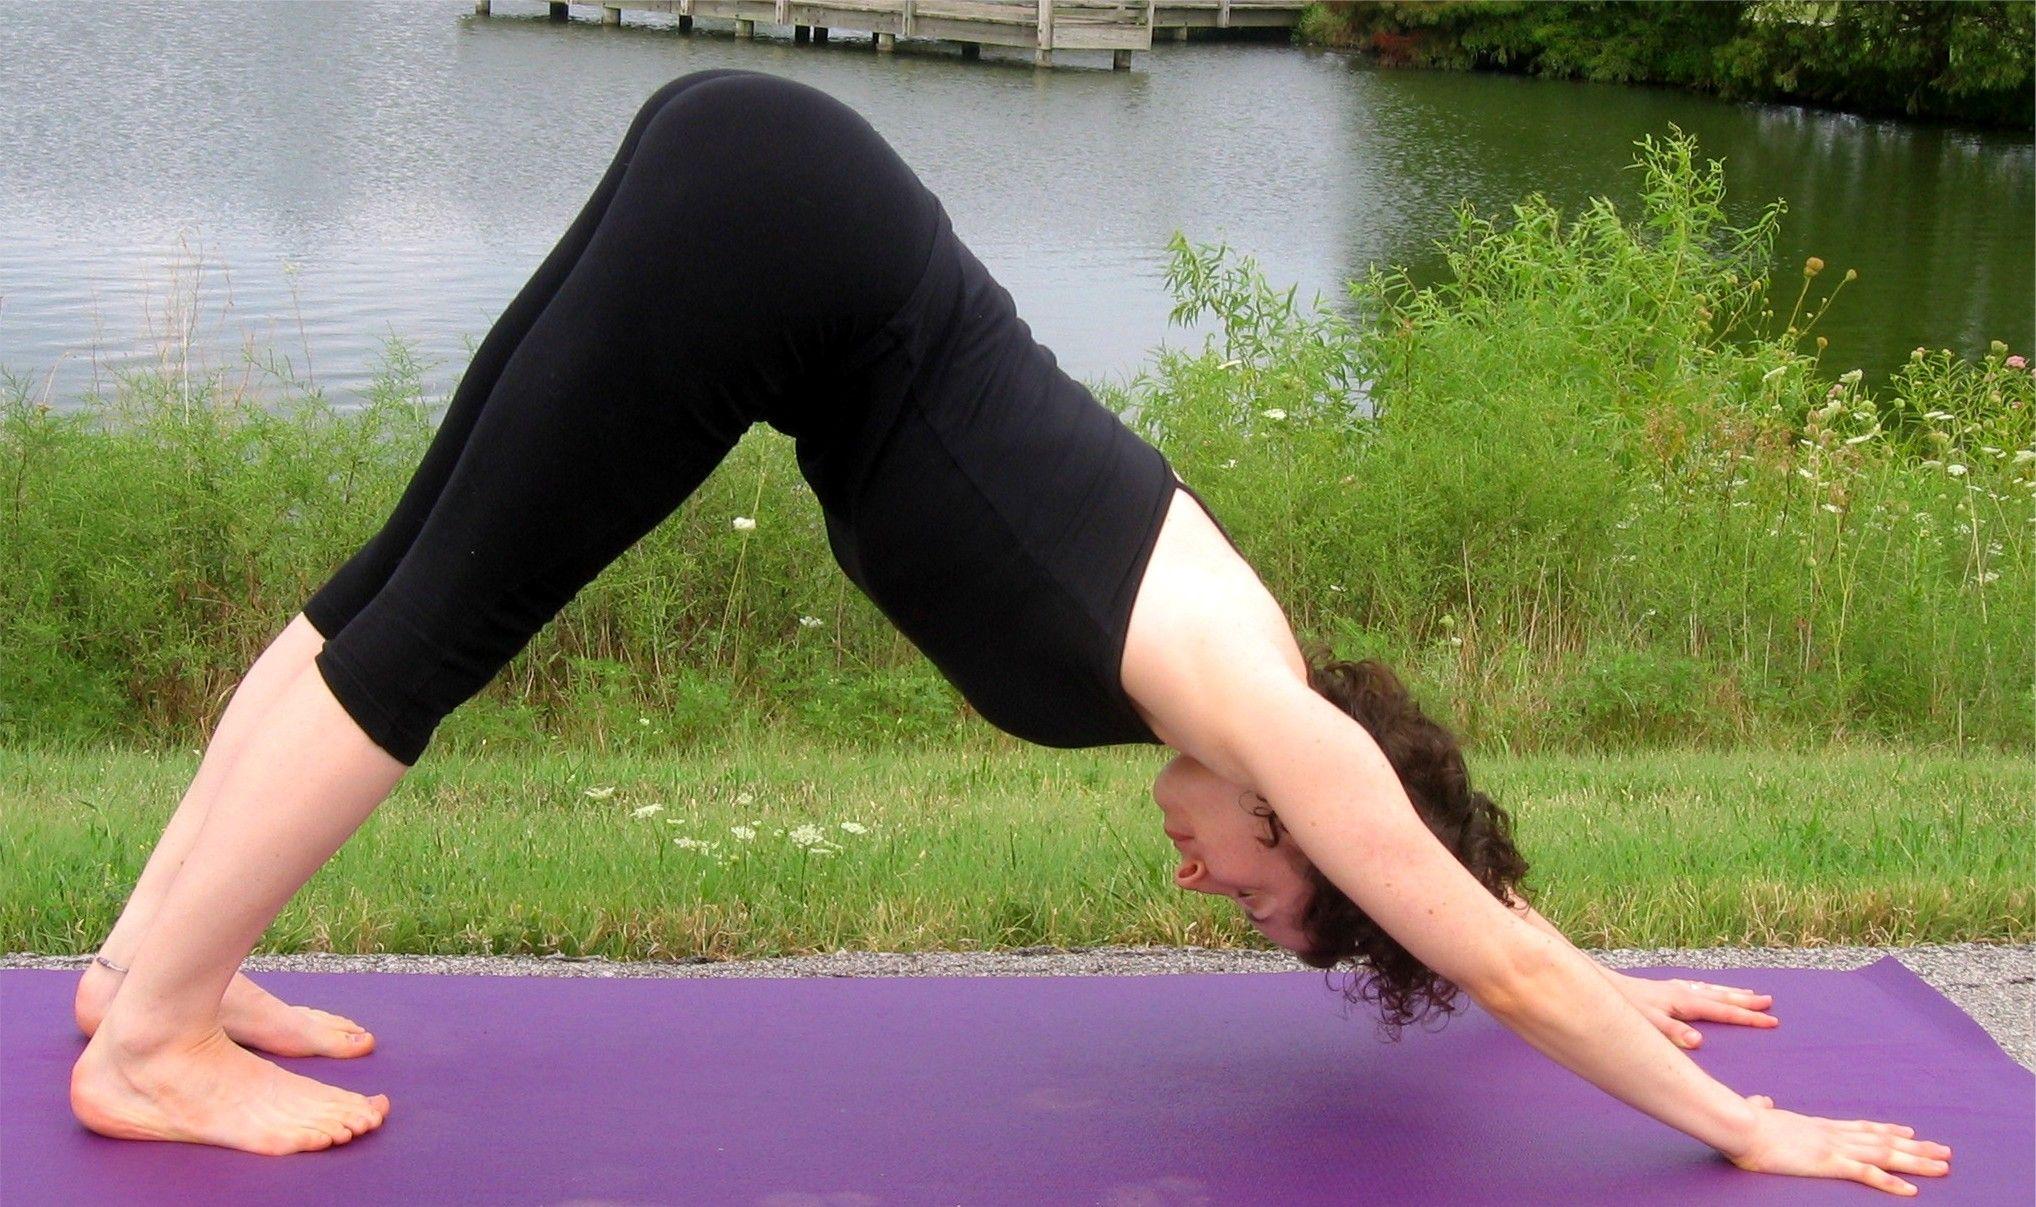 photo Yoga Pose of the Day: Downward-Facing Dog